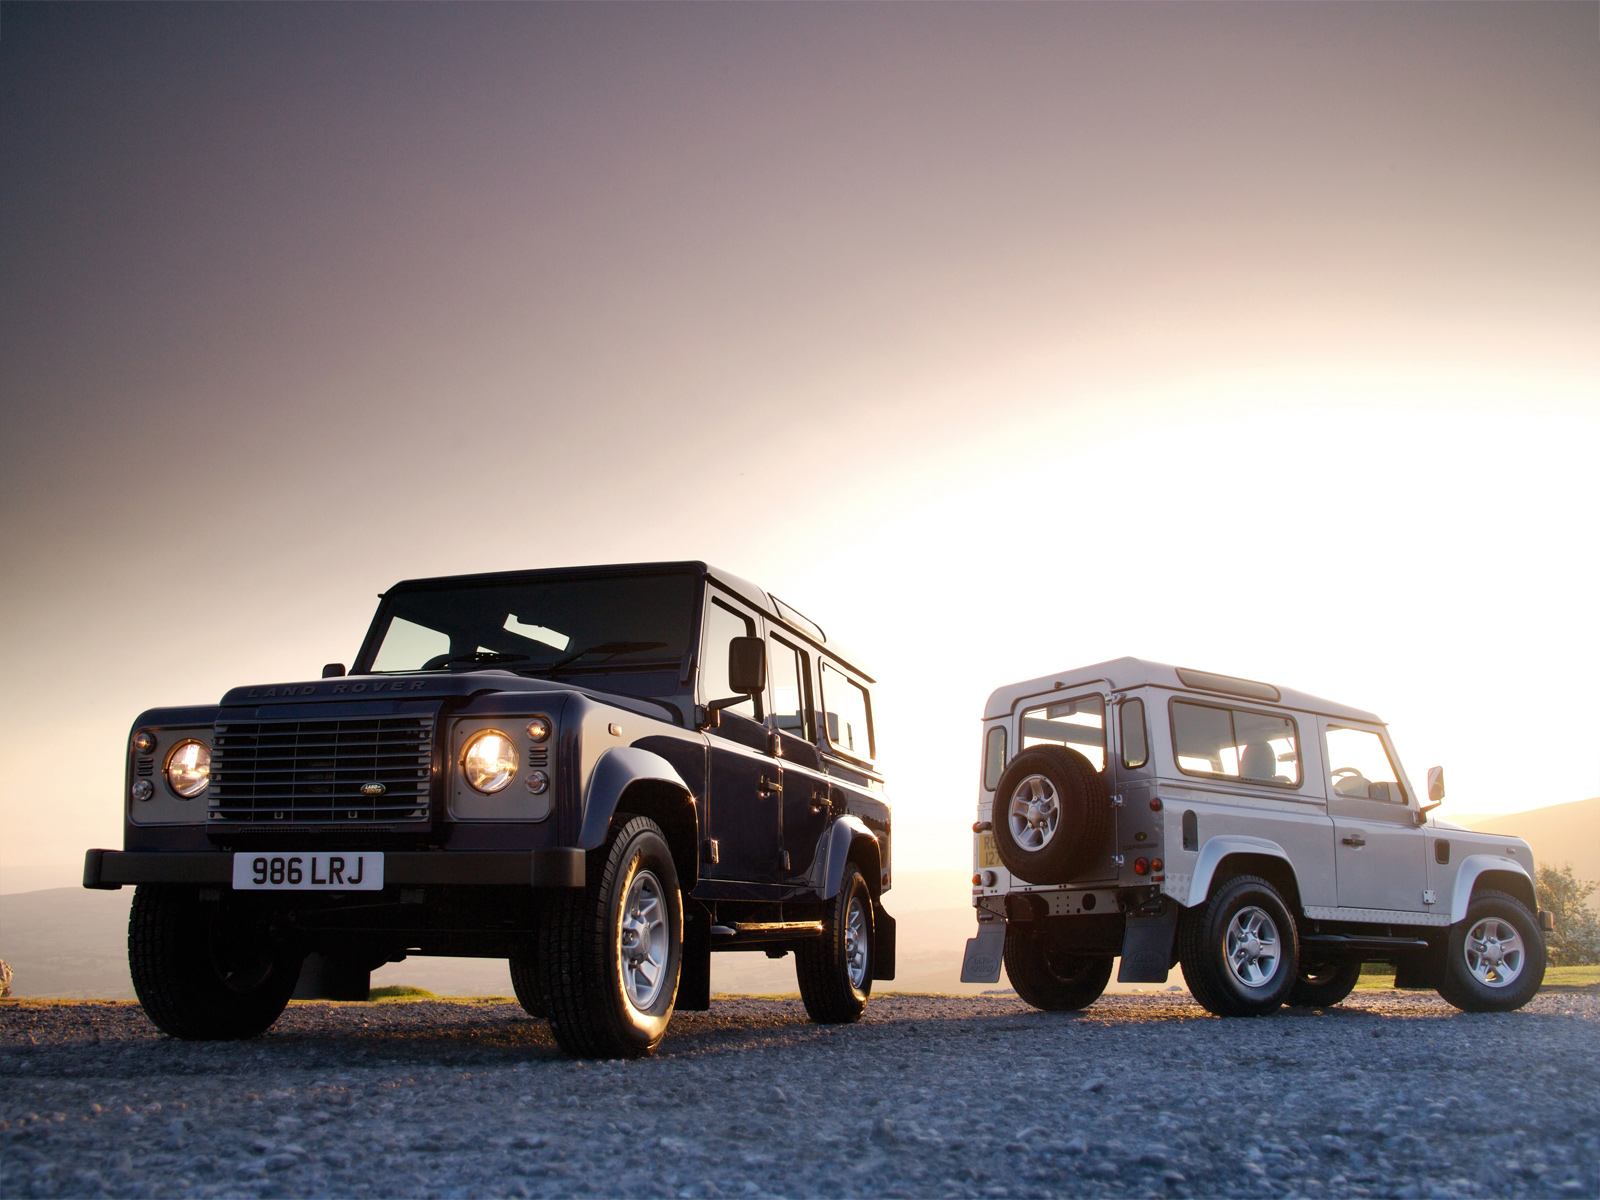 The original Land Rover Defender - credit: JLR